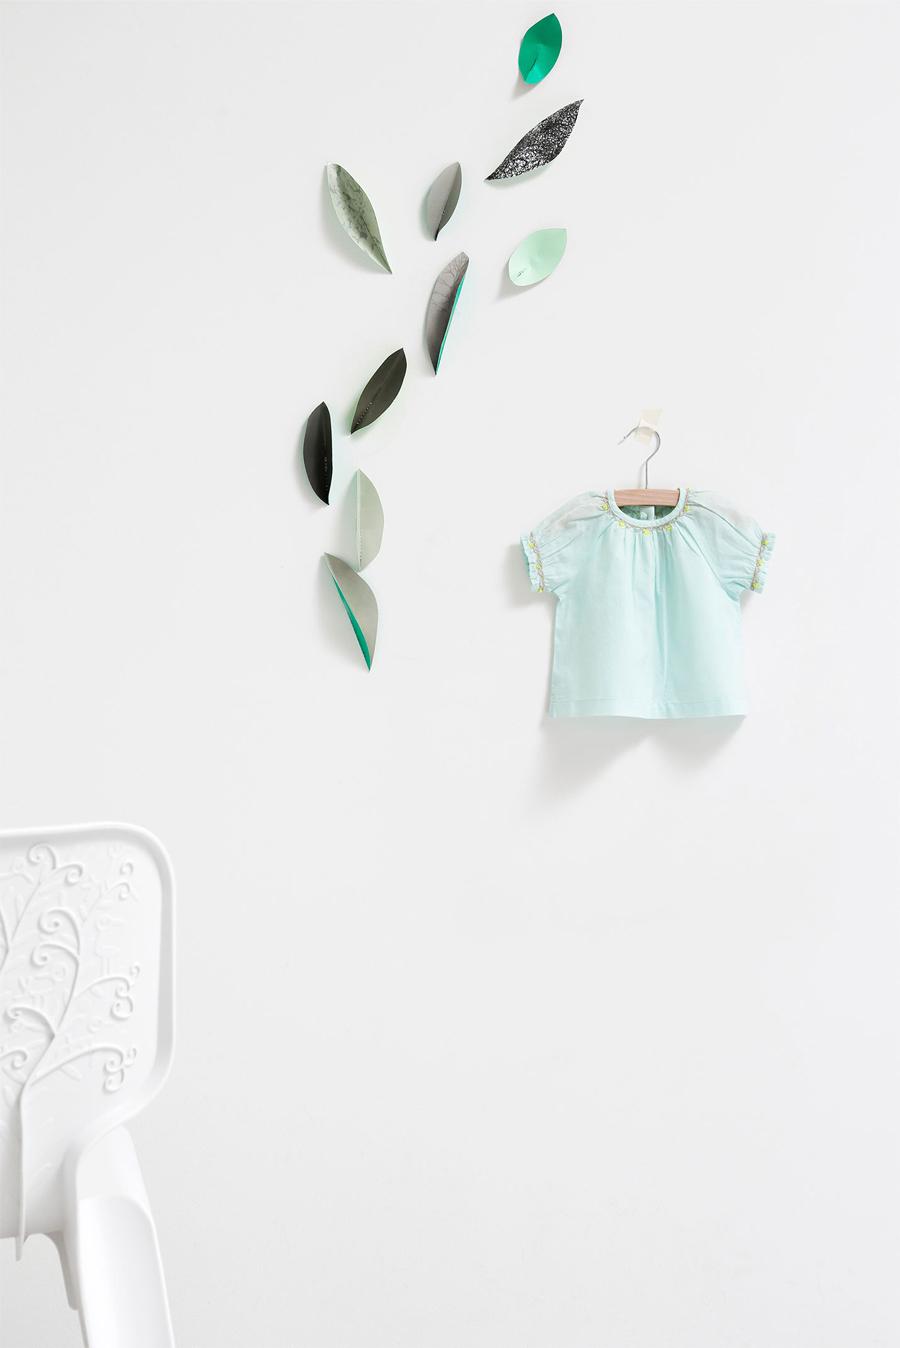 zara-aprilandmay-spring-collection-beeldsteil-6.jpg